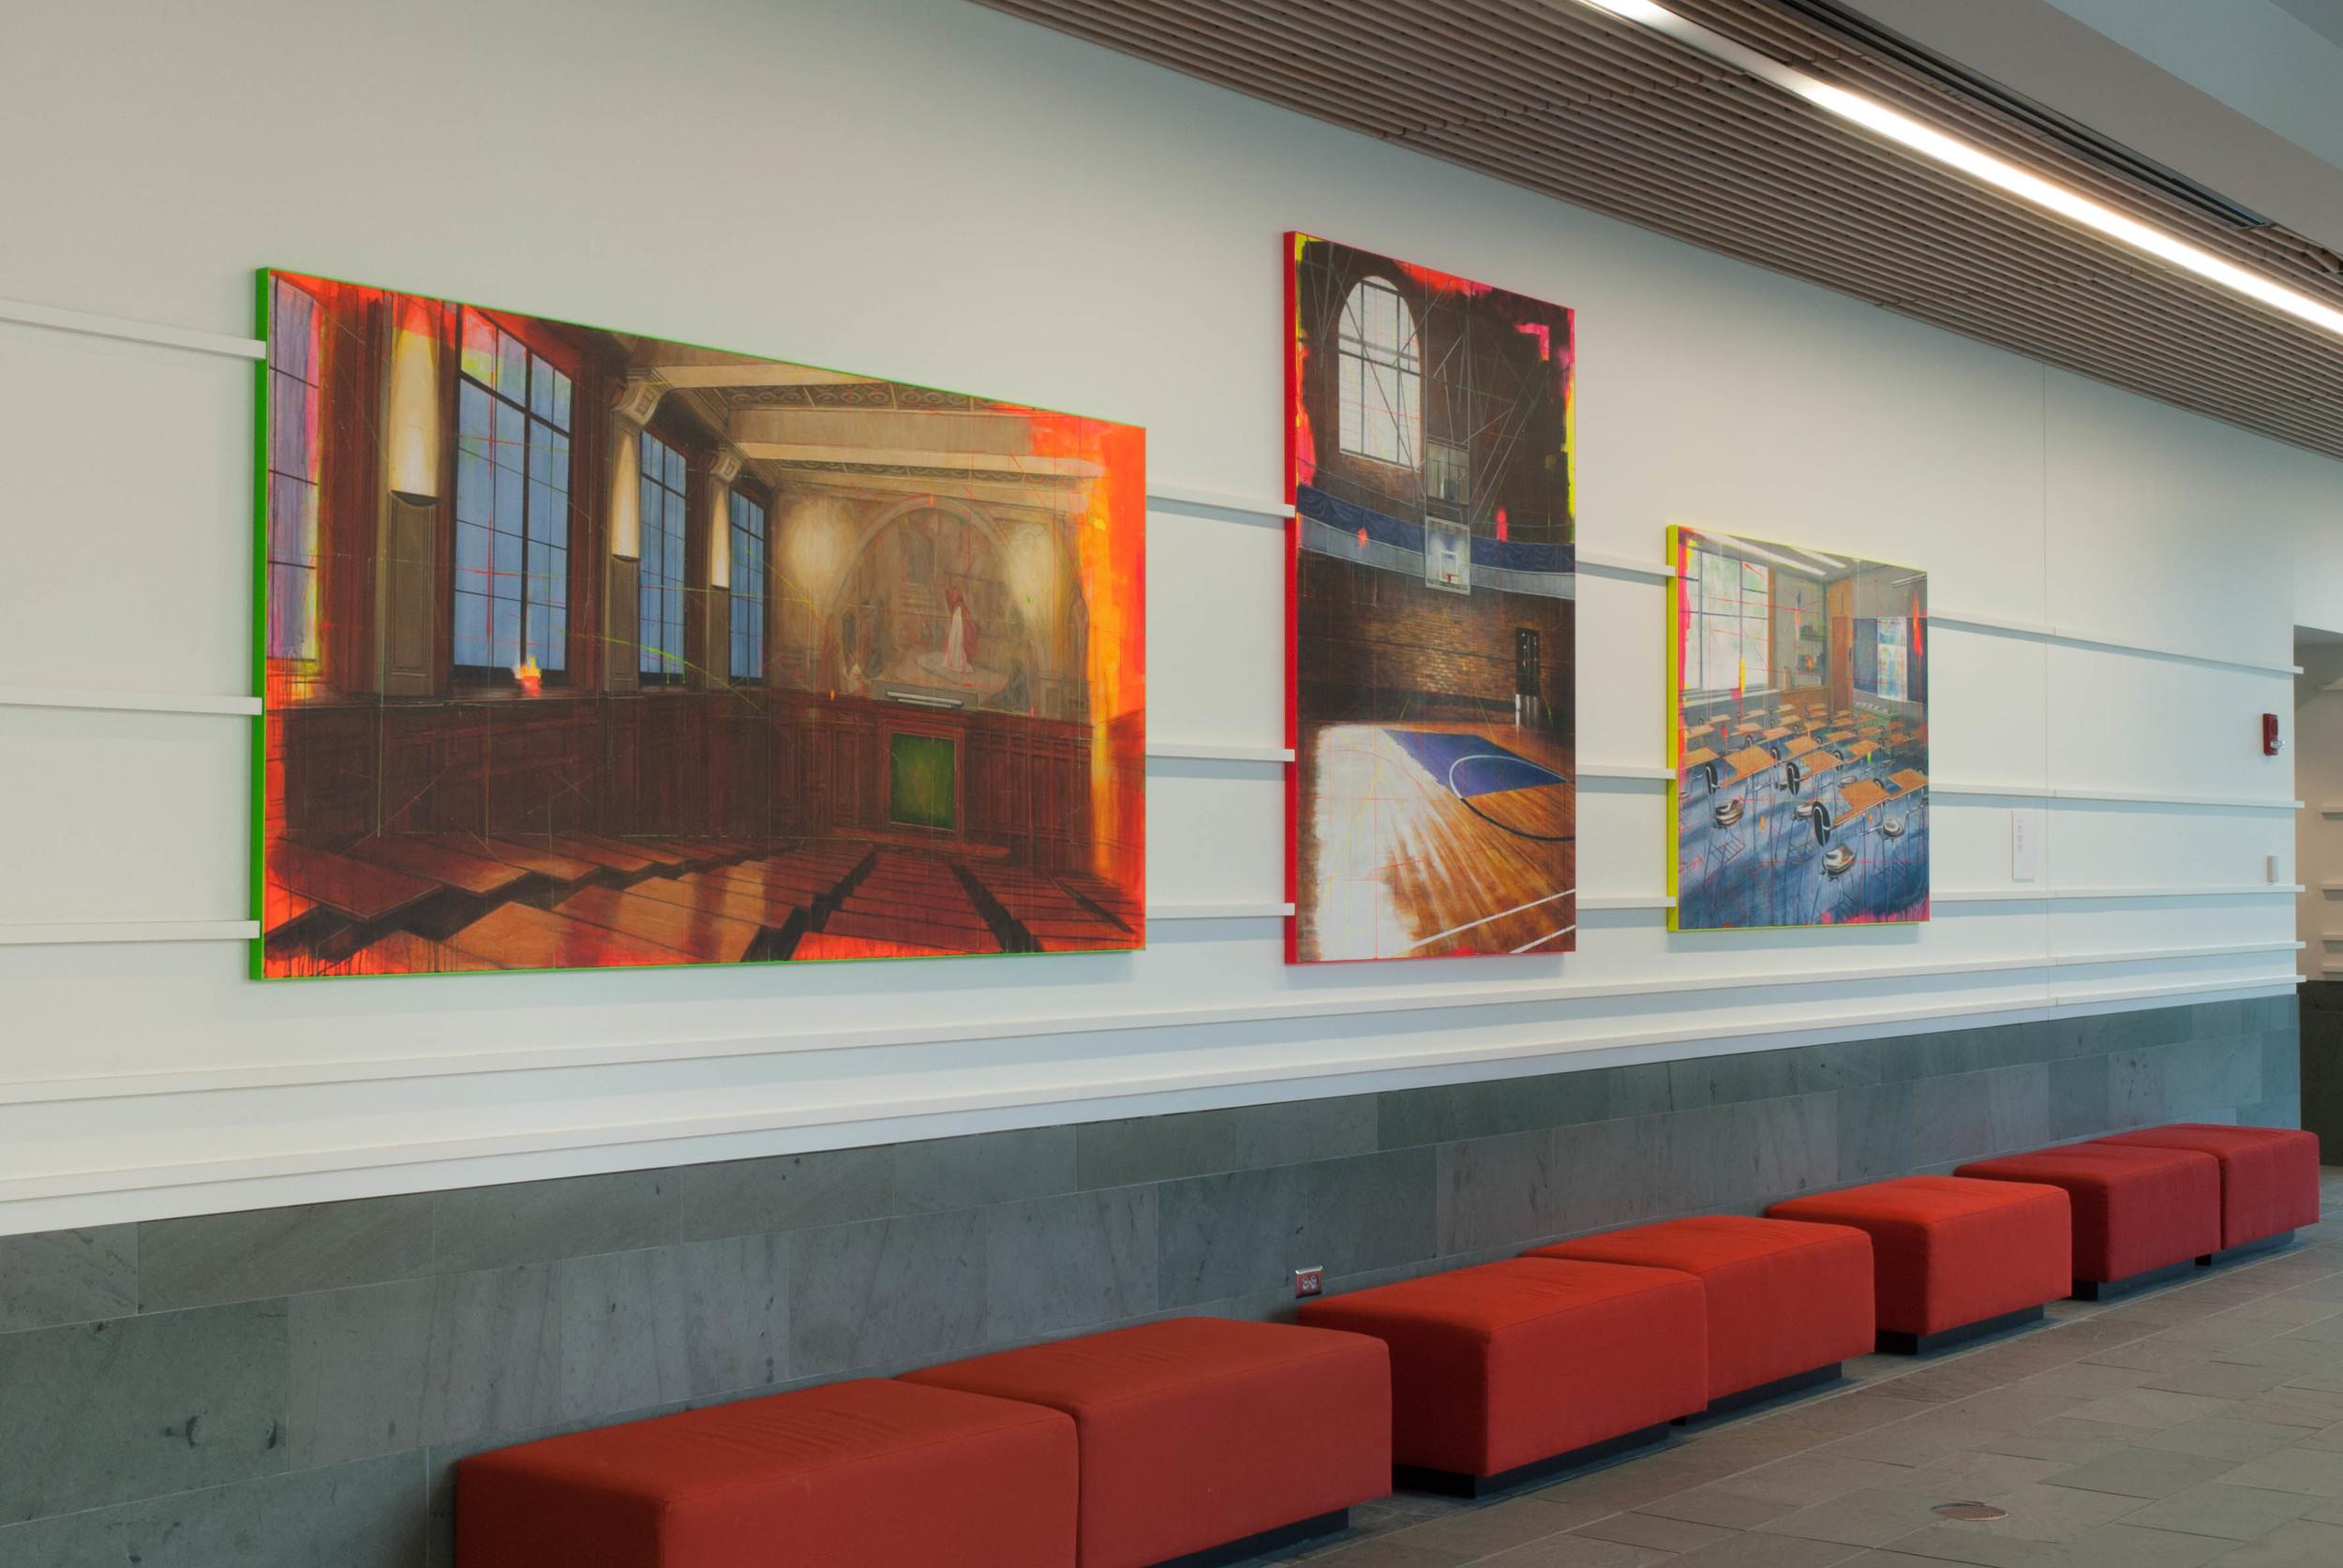 University of Connecticut, Laurel Hall, Storrs, CT, 2014